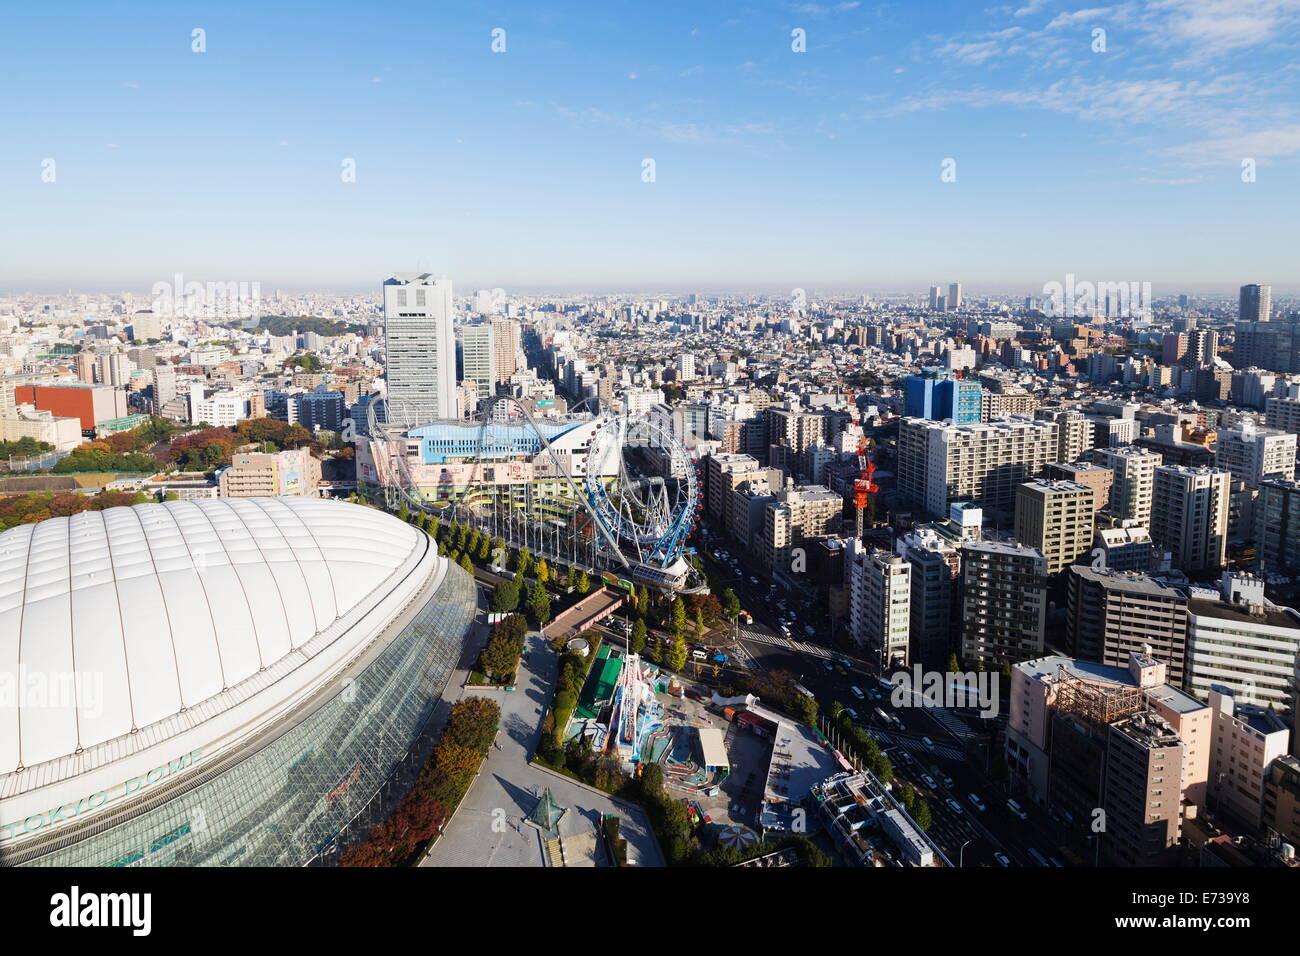 Tokyo Dome, Tokyo, Honshu, Japan, Asia - Stock Image